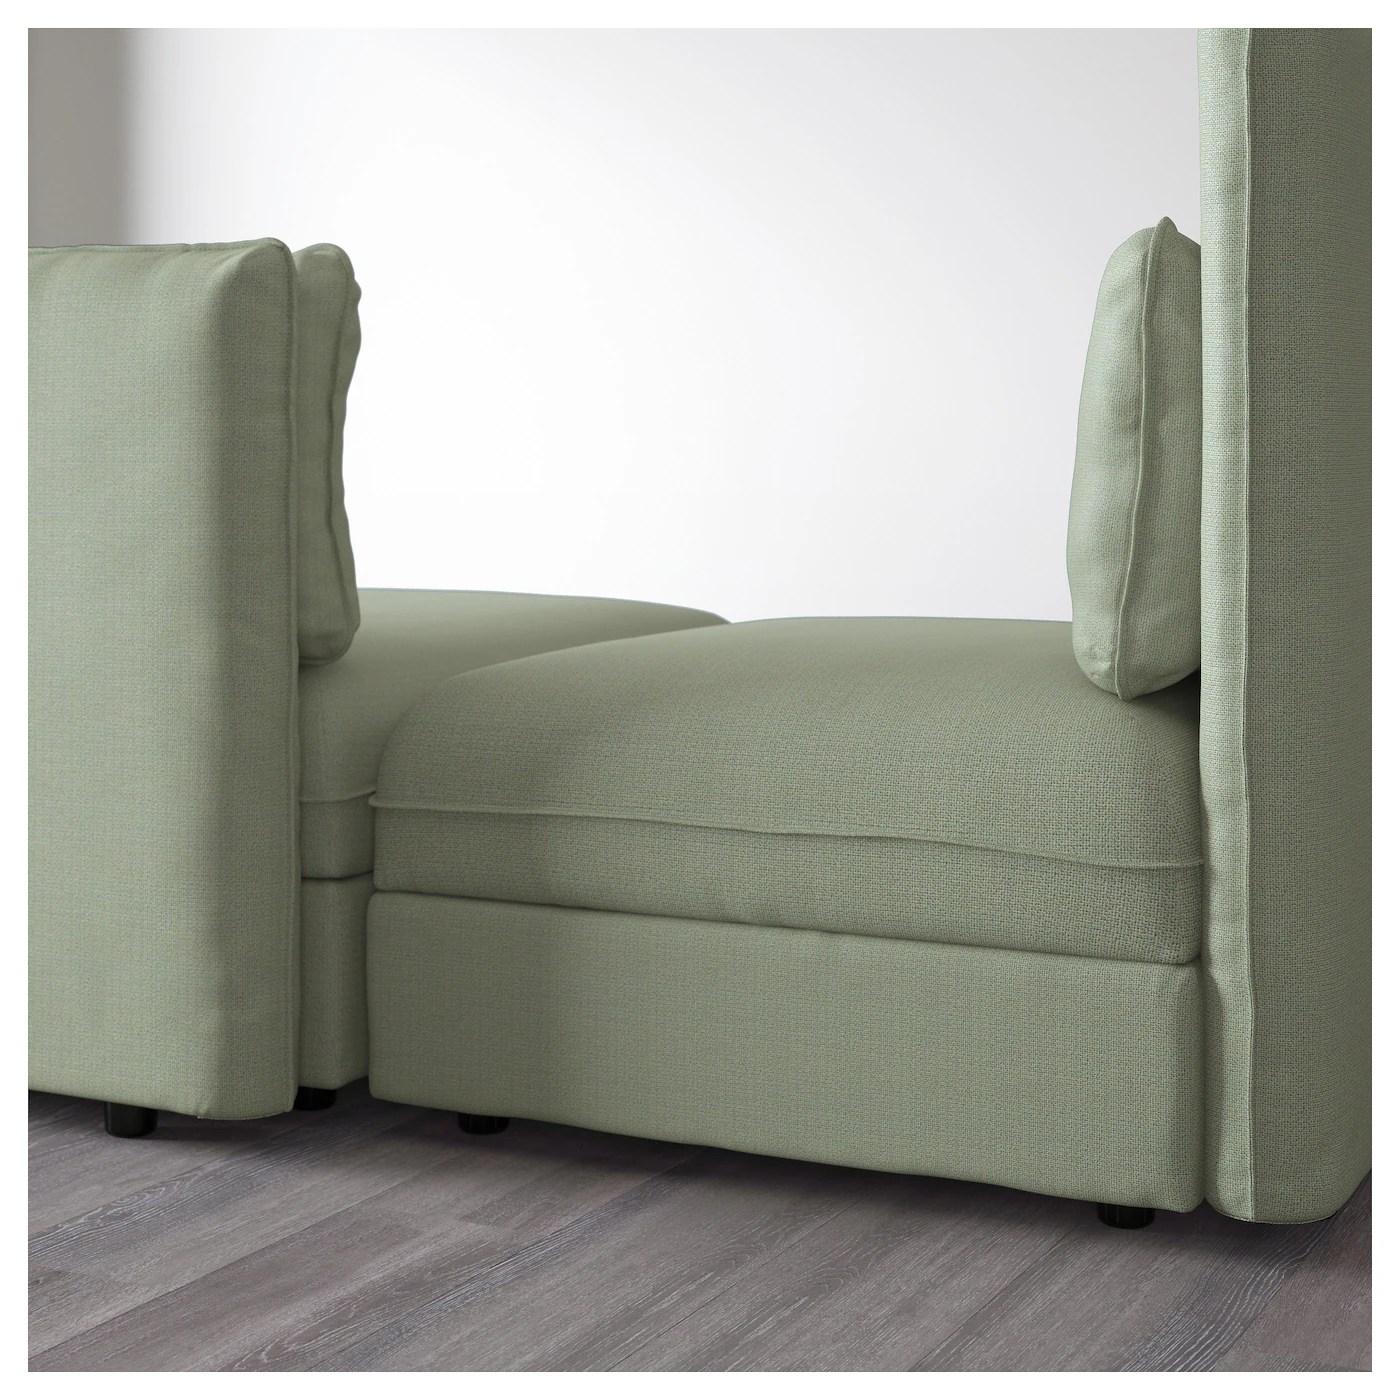 light green sofa bed waterproof mattress pad for vallentuna 3 seat with hillared ikea